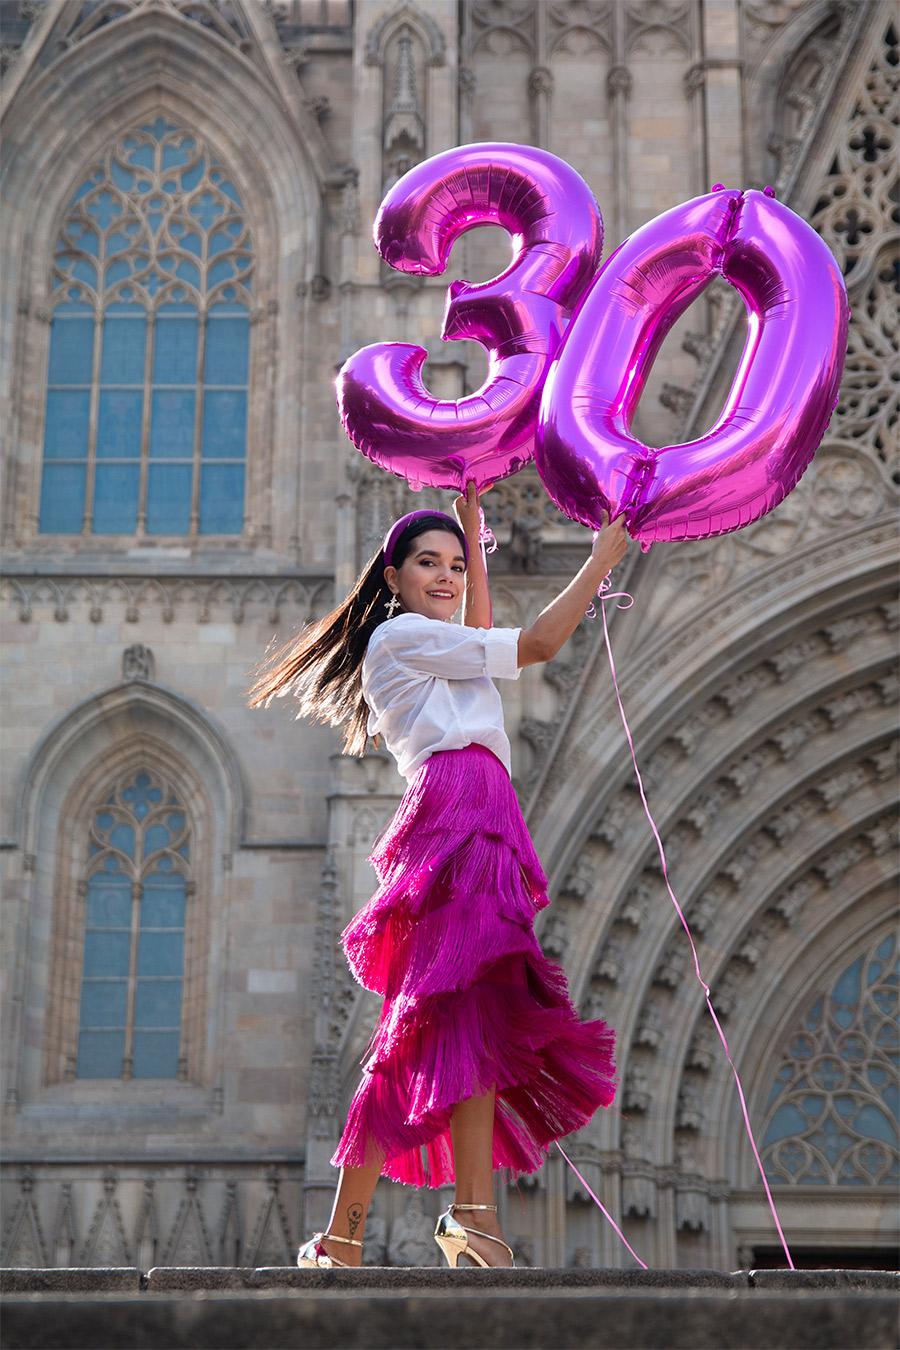 30s-birthday-photo-ideas,-birthday-photoshoot,-photoshoot-in-Barcelona